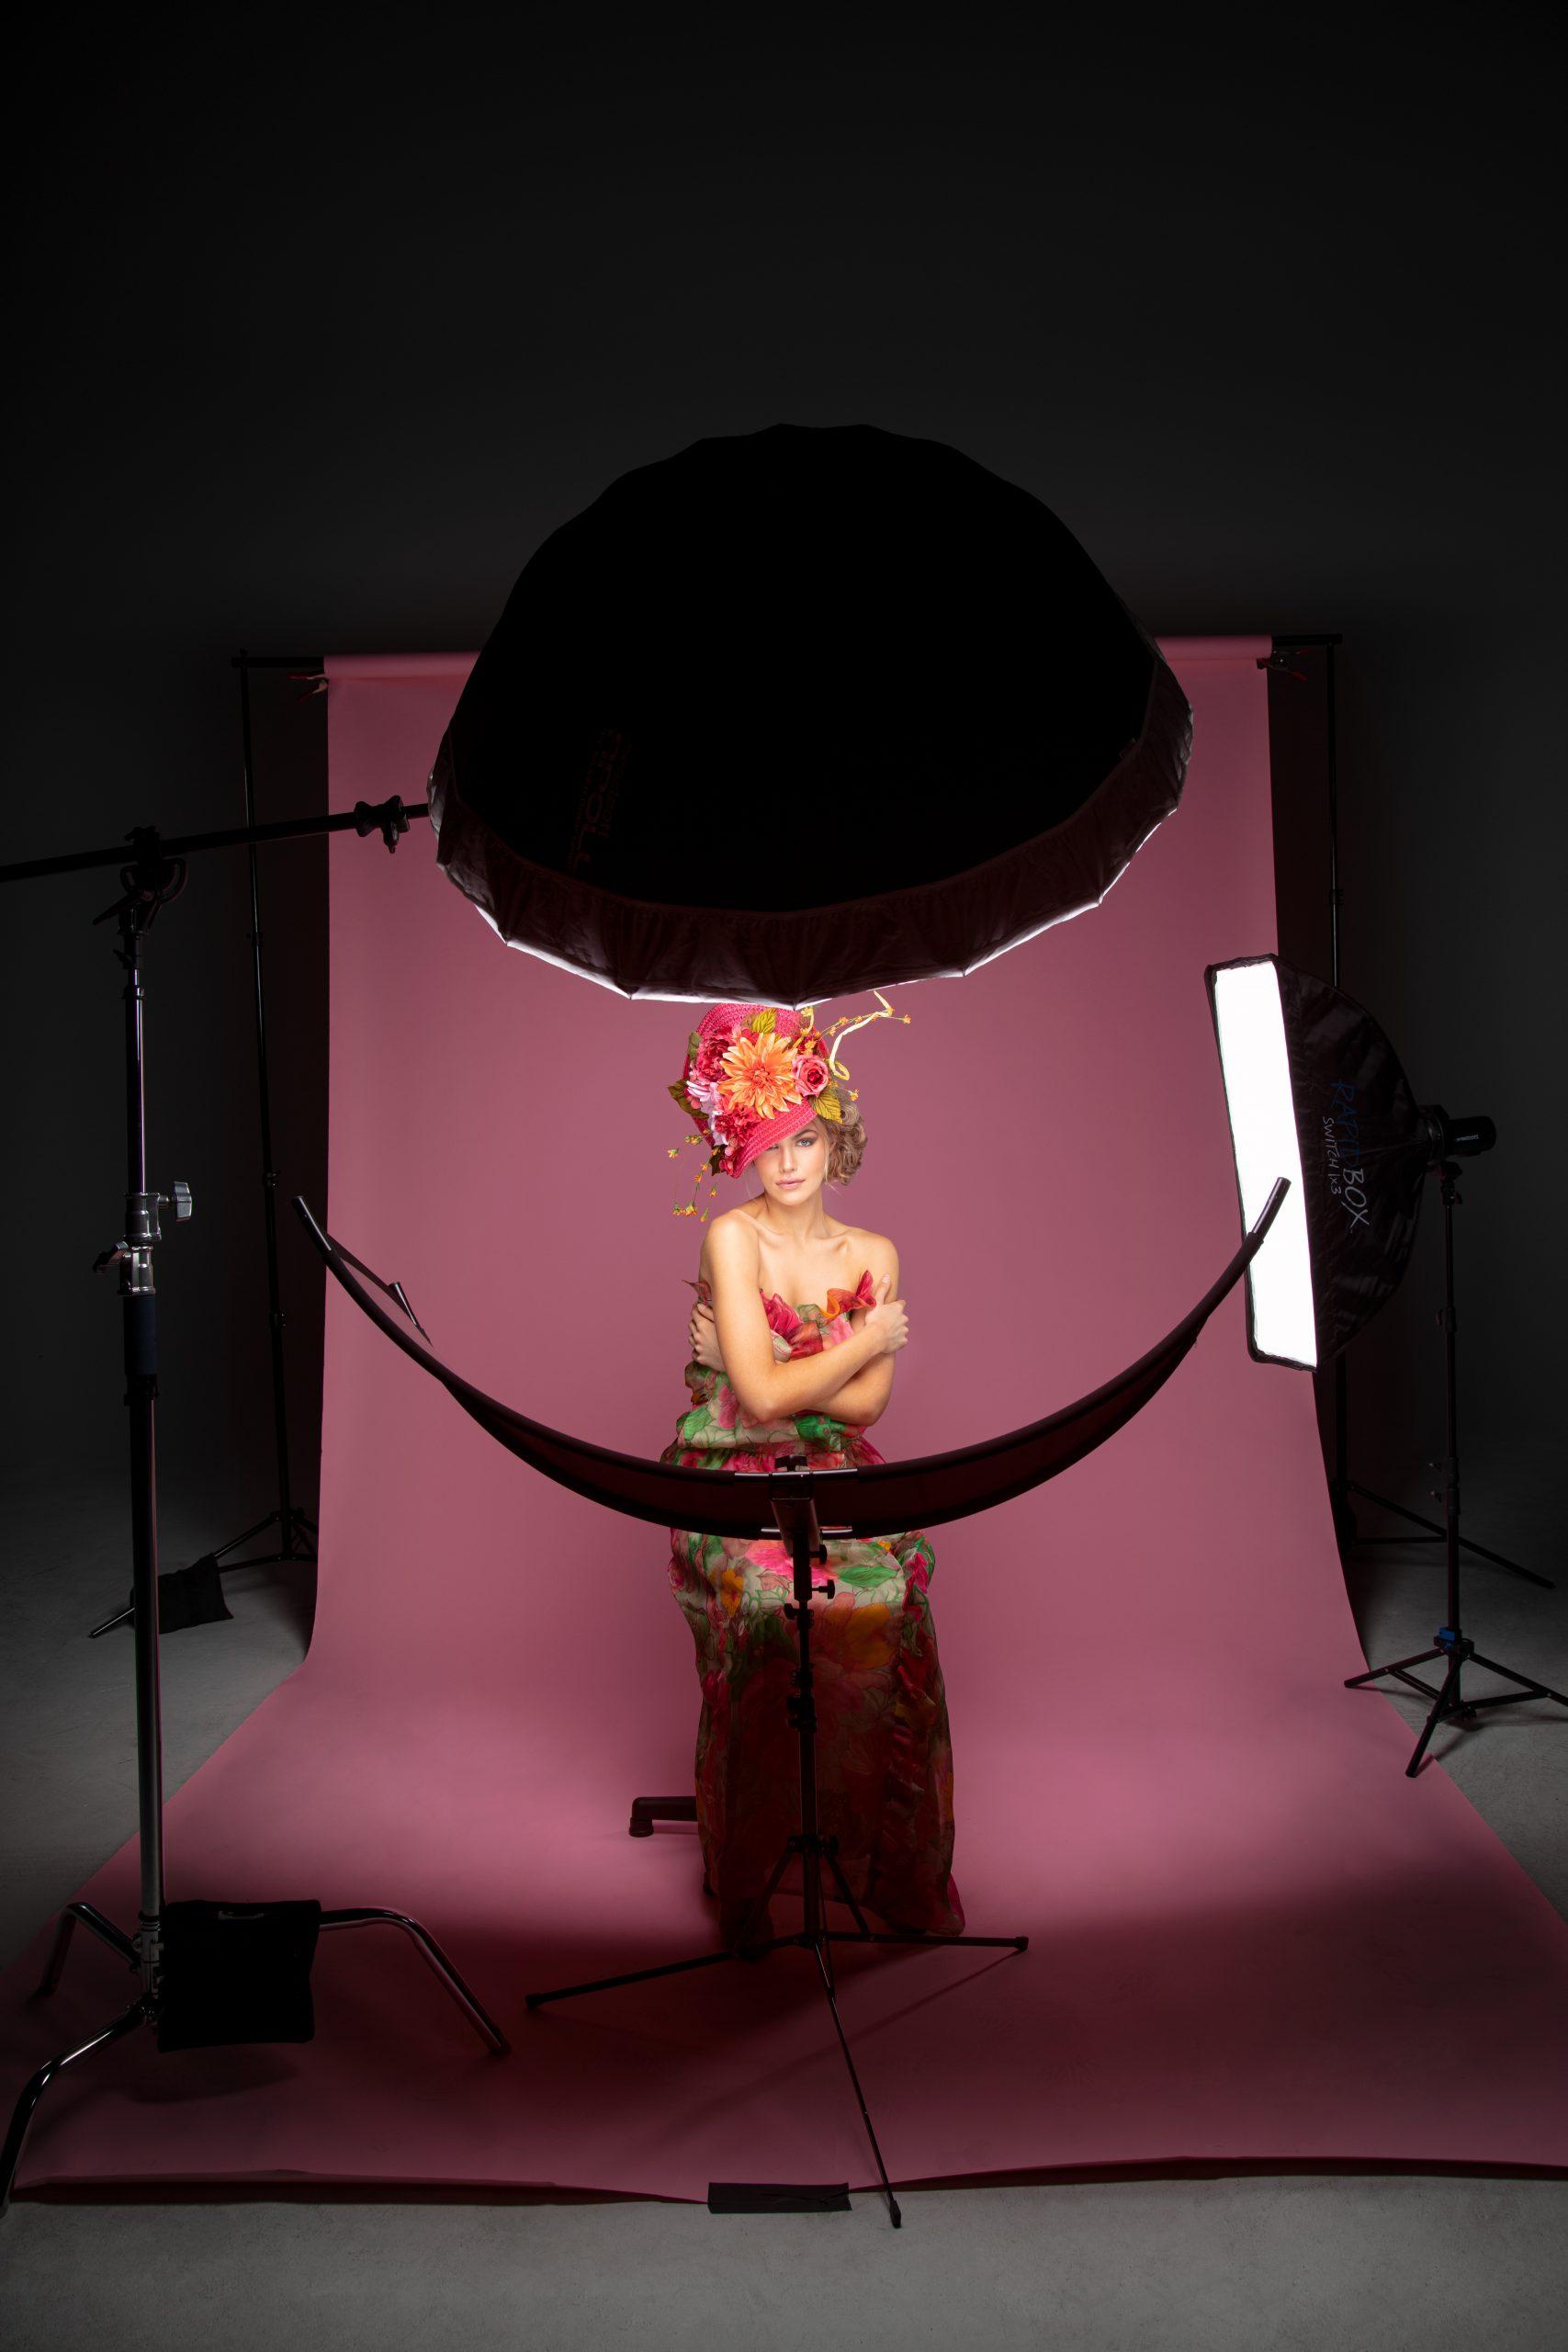 BTS of 43 Inch Umbrella, edge light and Eyelighter